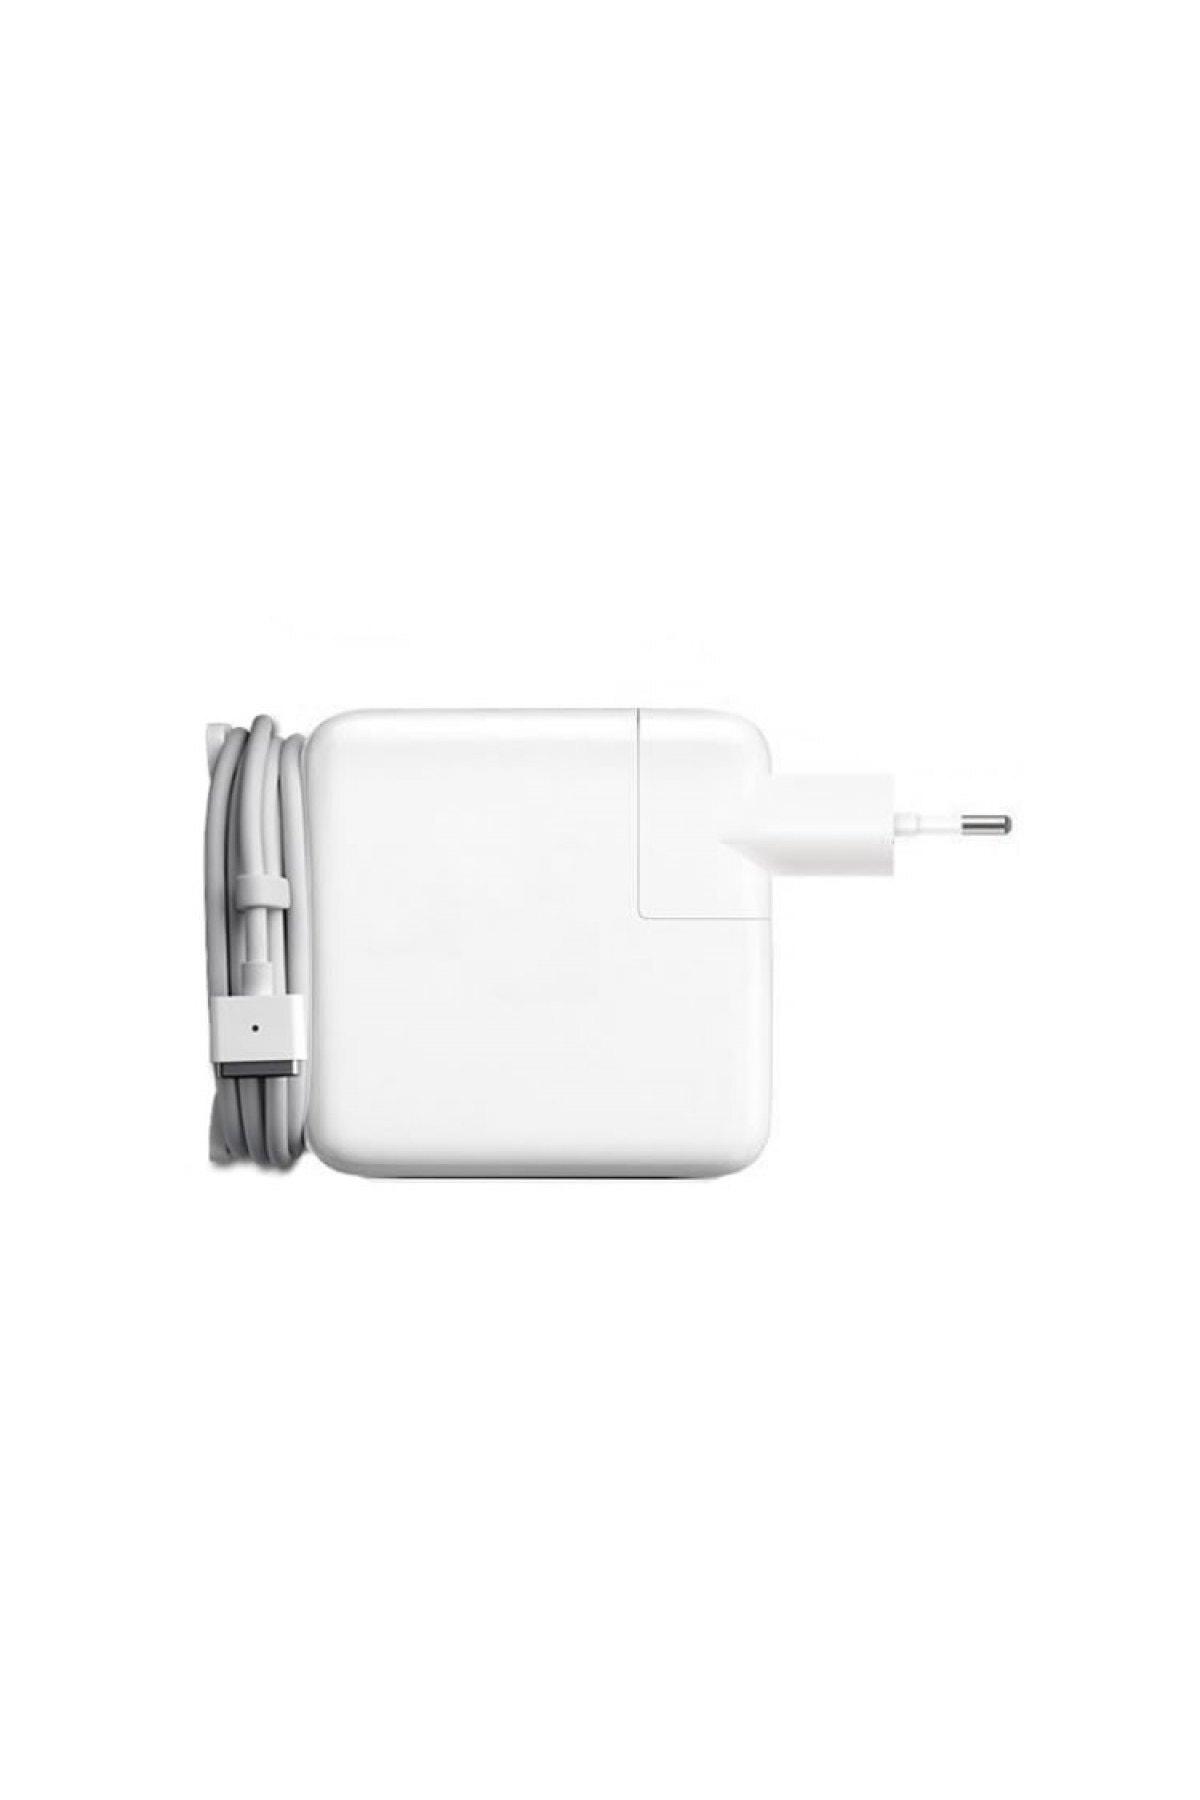 İnfomax Apple Macbook Air A1466 Adaptör Şarj Aleti 1